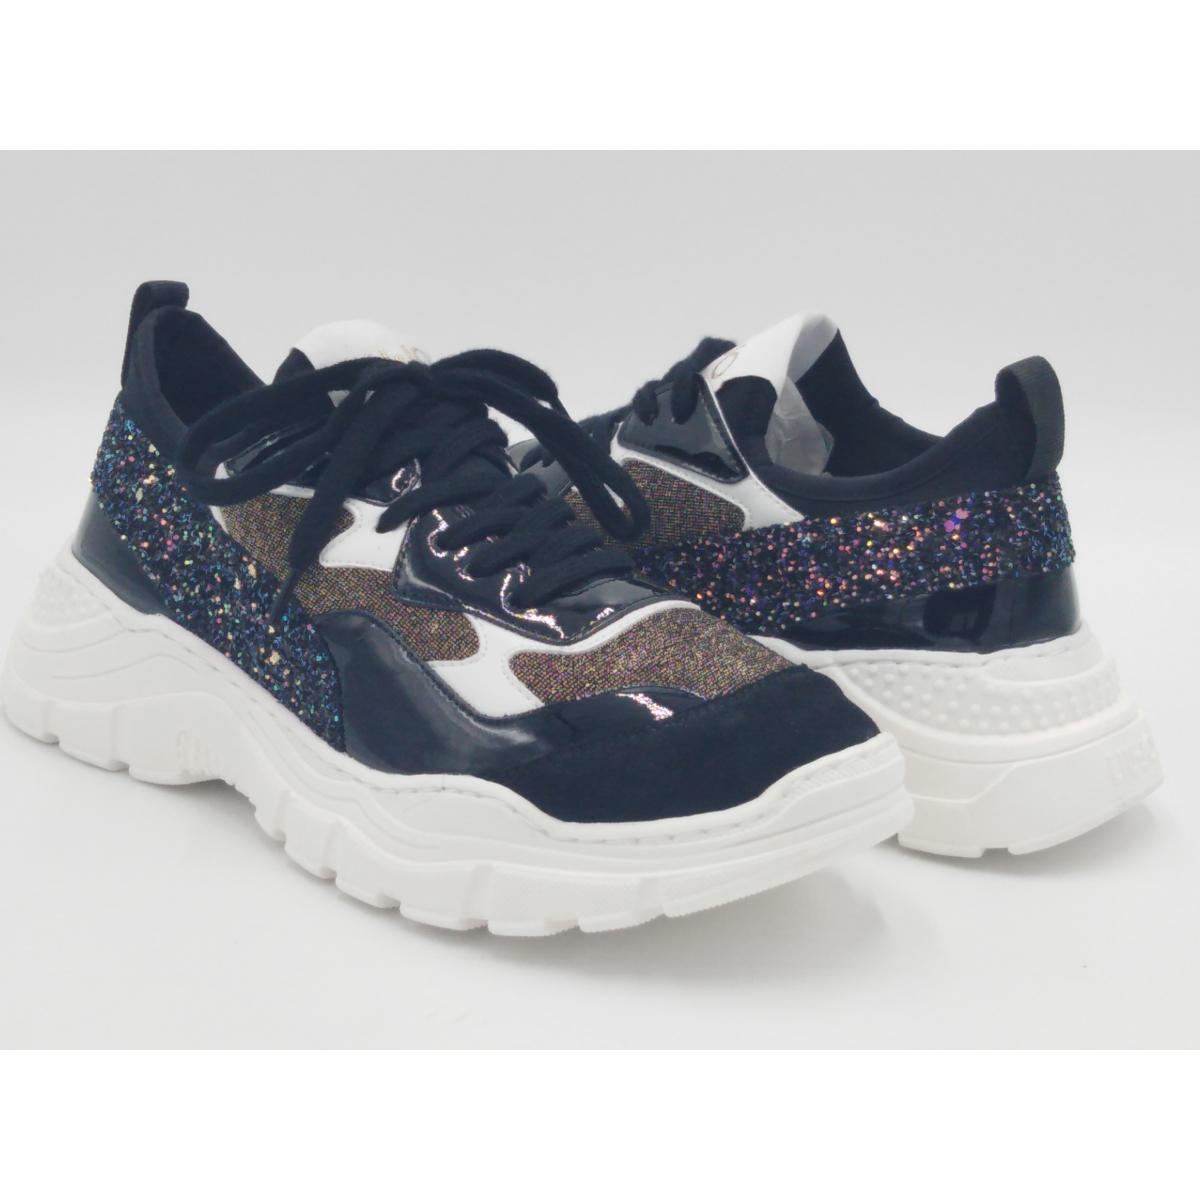 Liu Jo -Sneaker nero lucido...